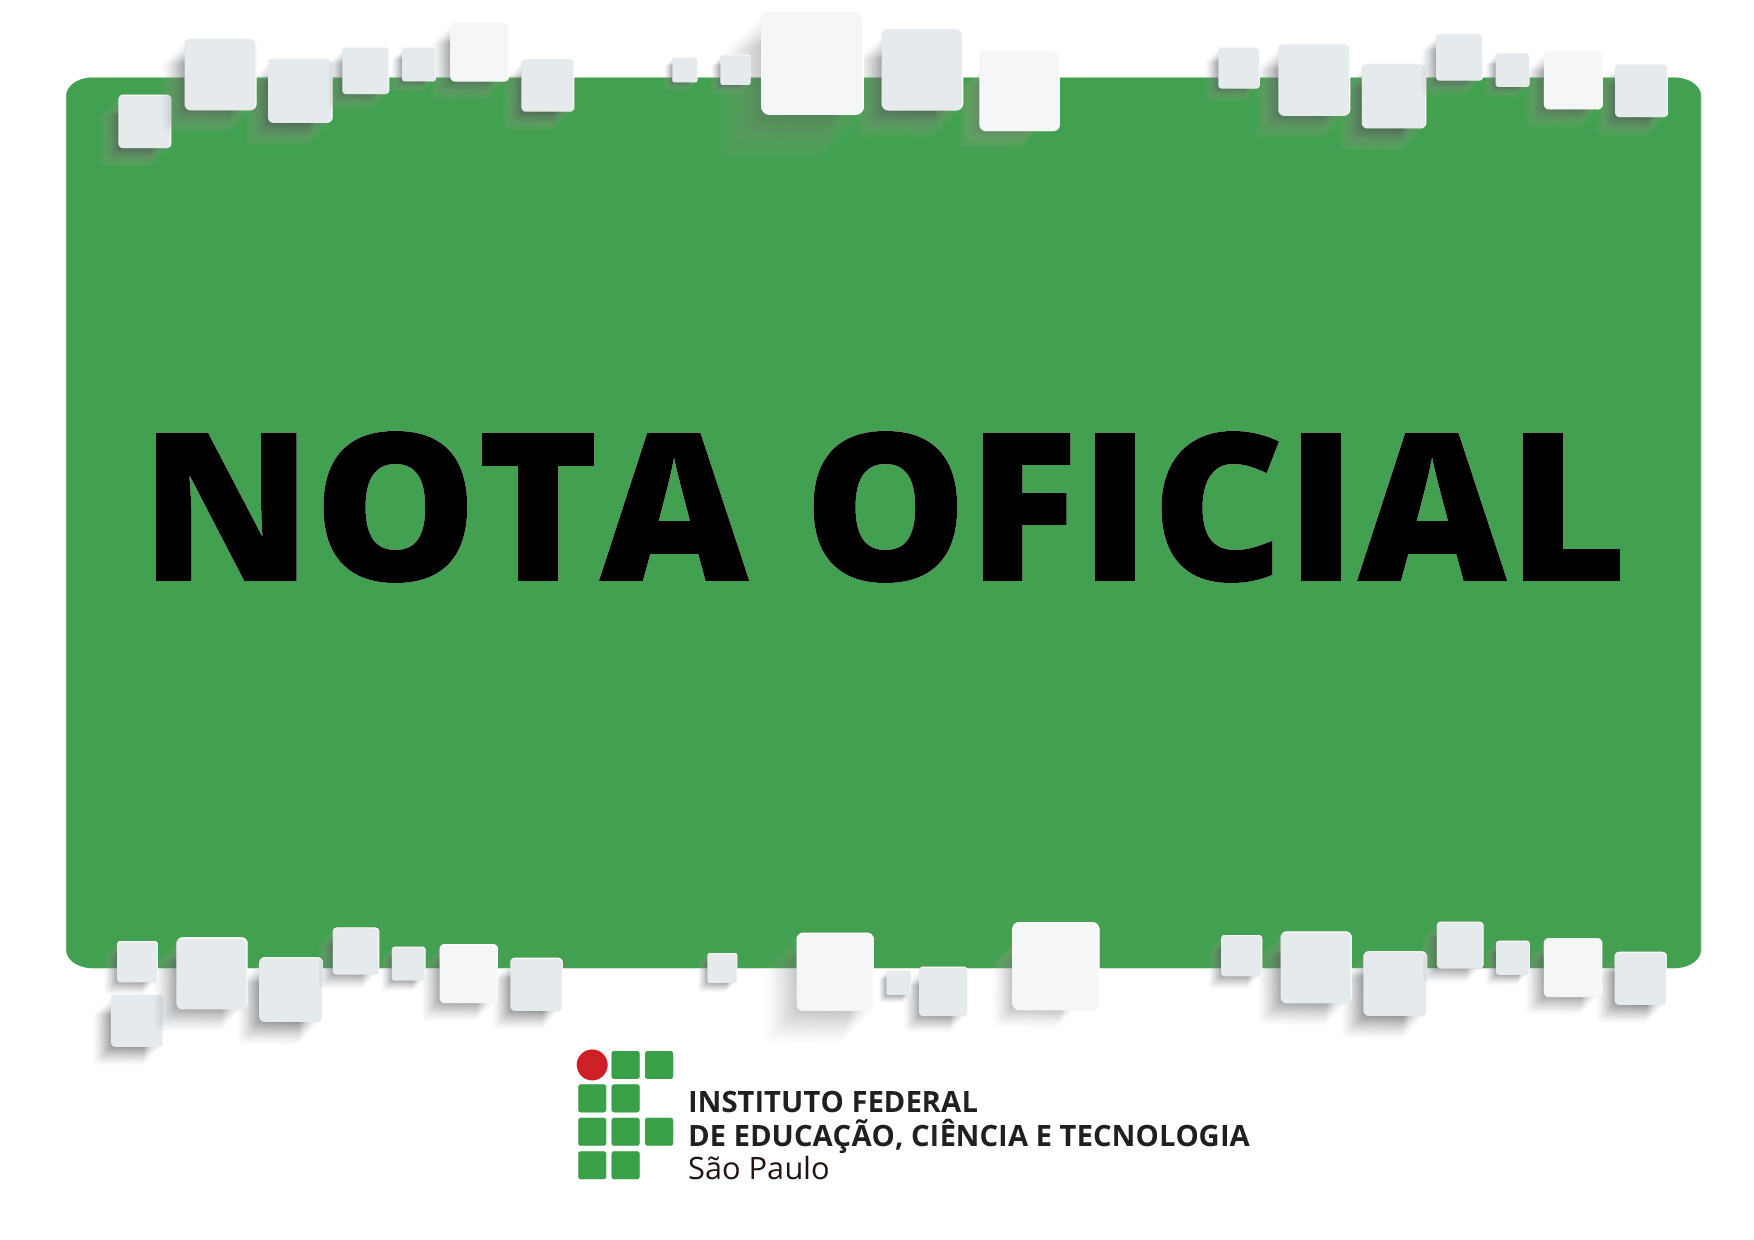 COMUNICADO A TODA COMUNIDADE DO IFSP